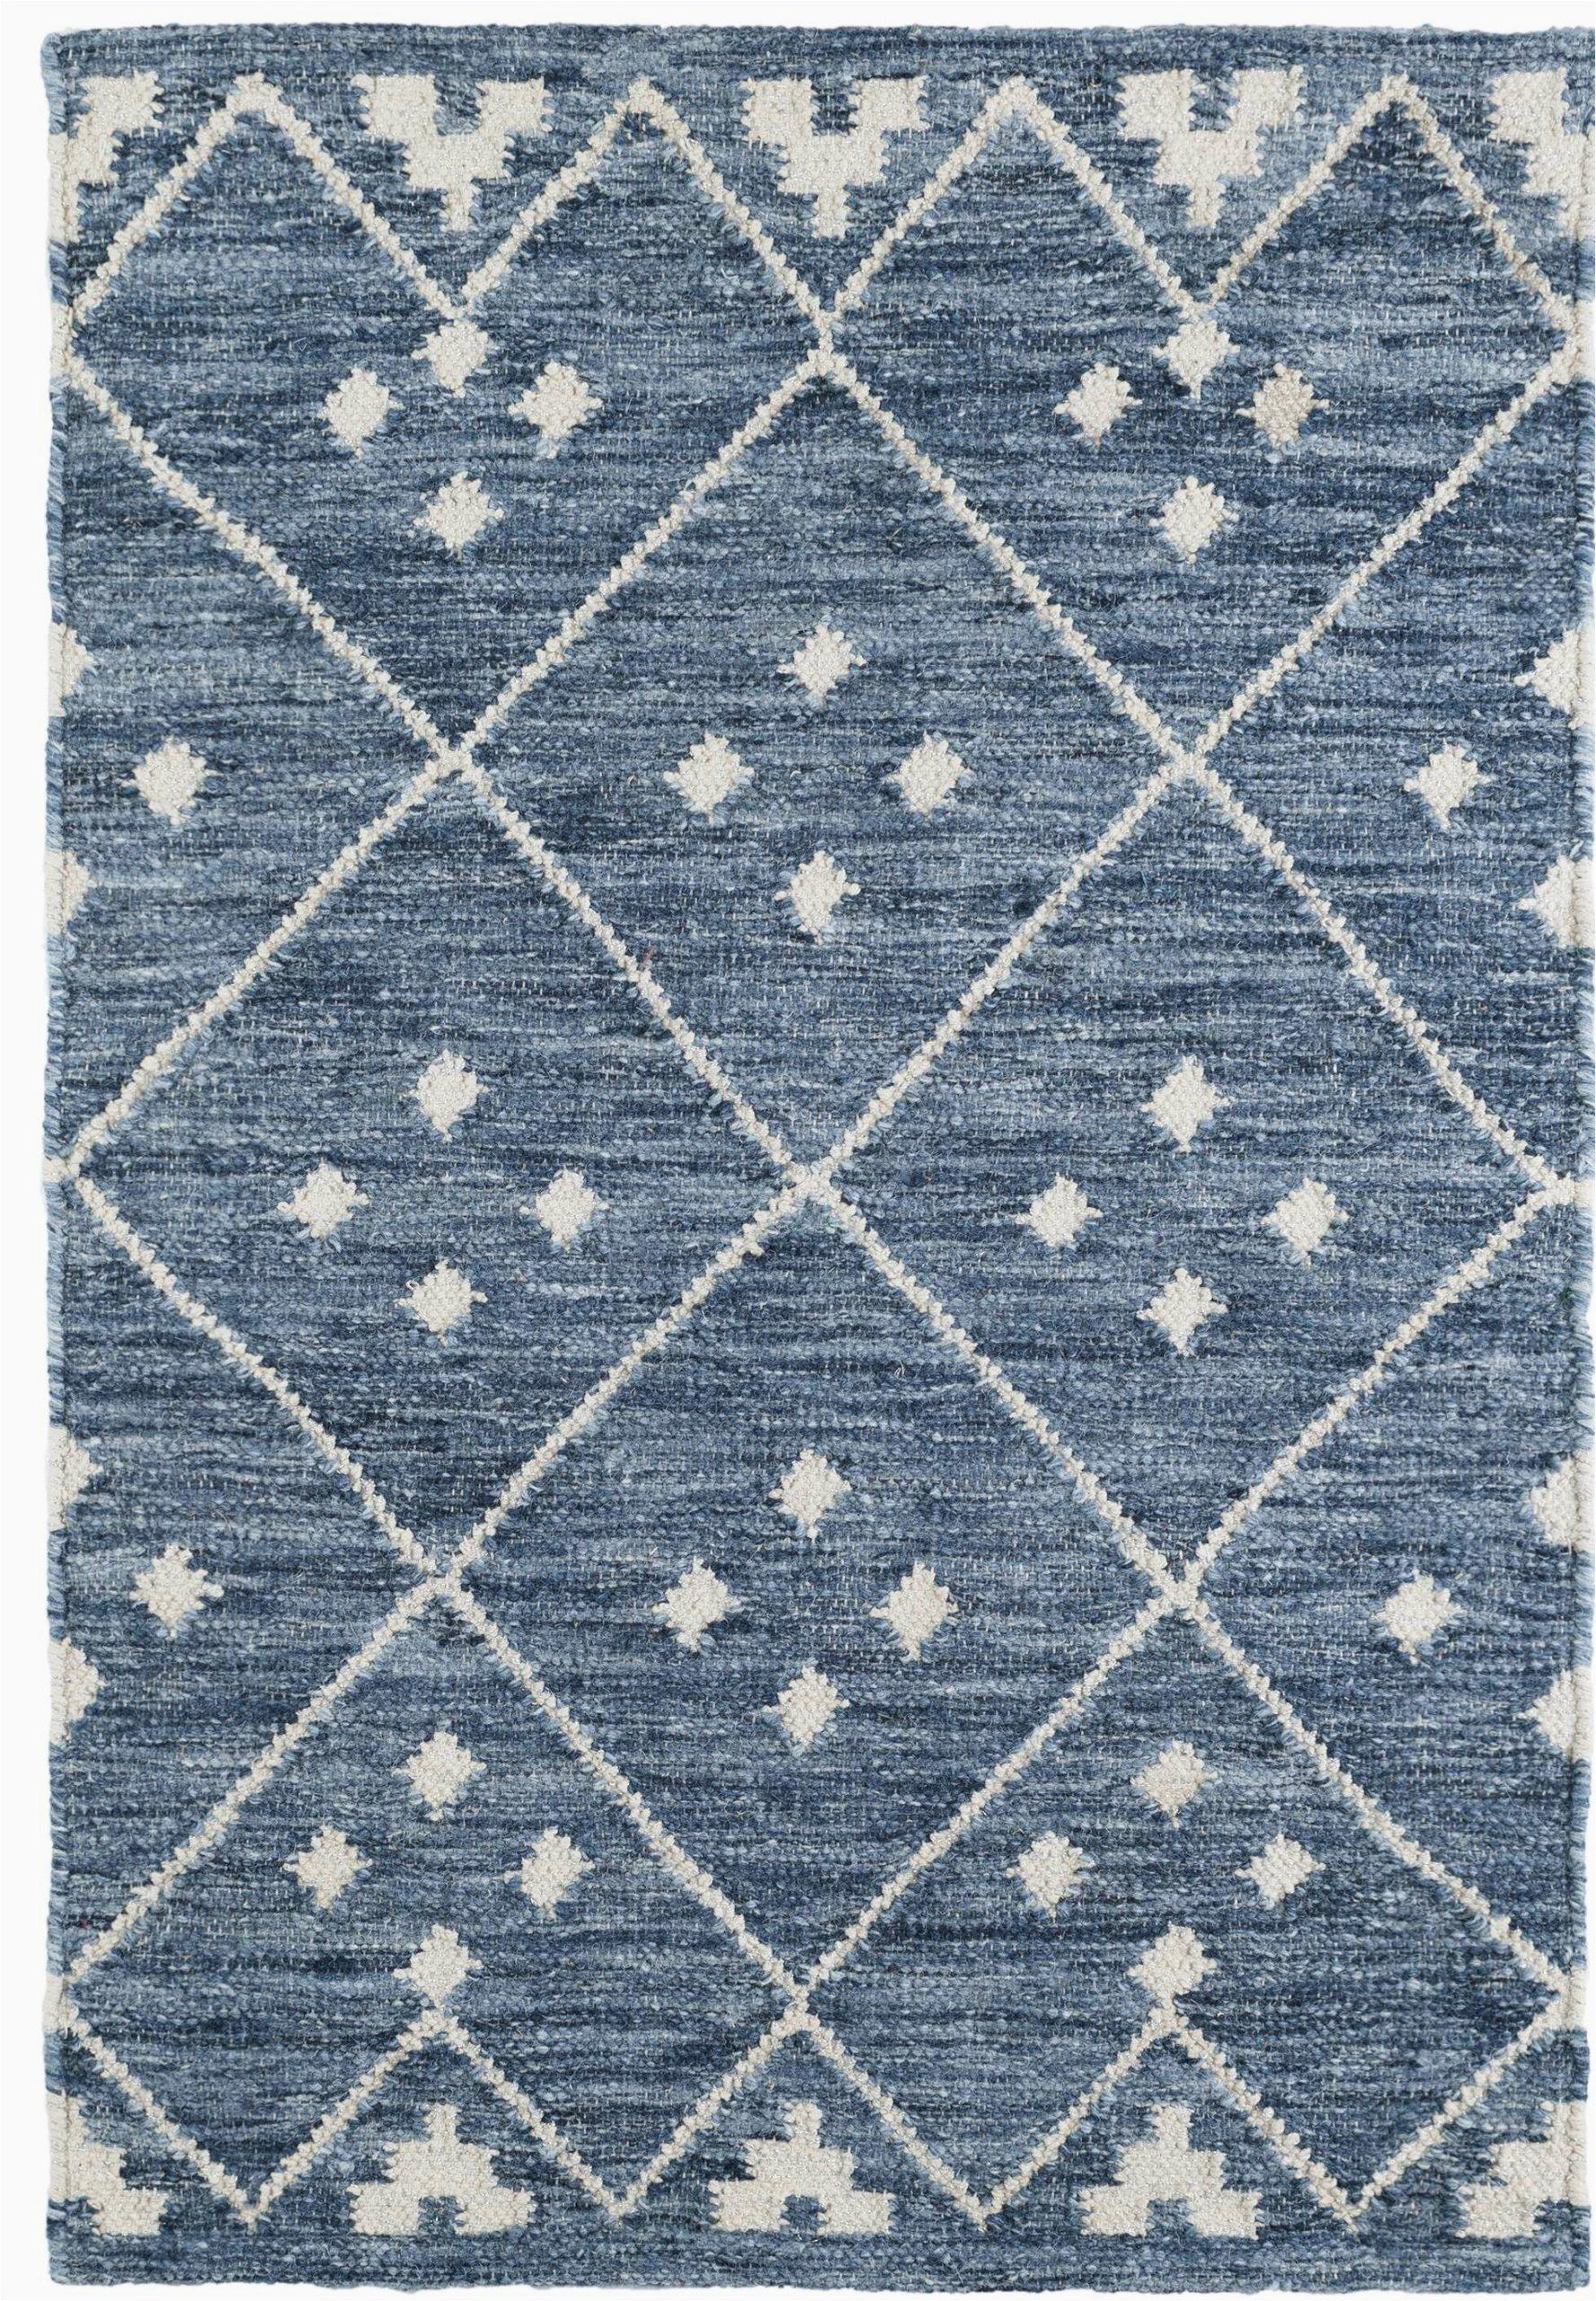 kota geometric handmade kilim bluewhite area rug